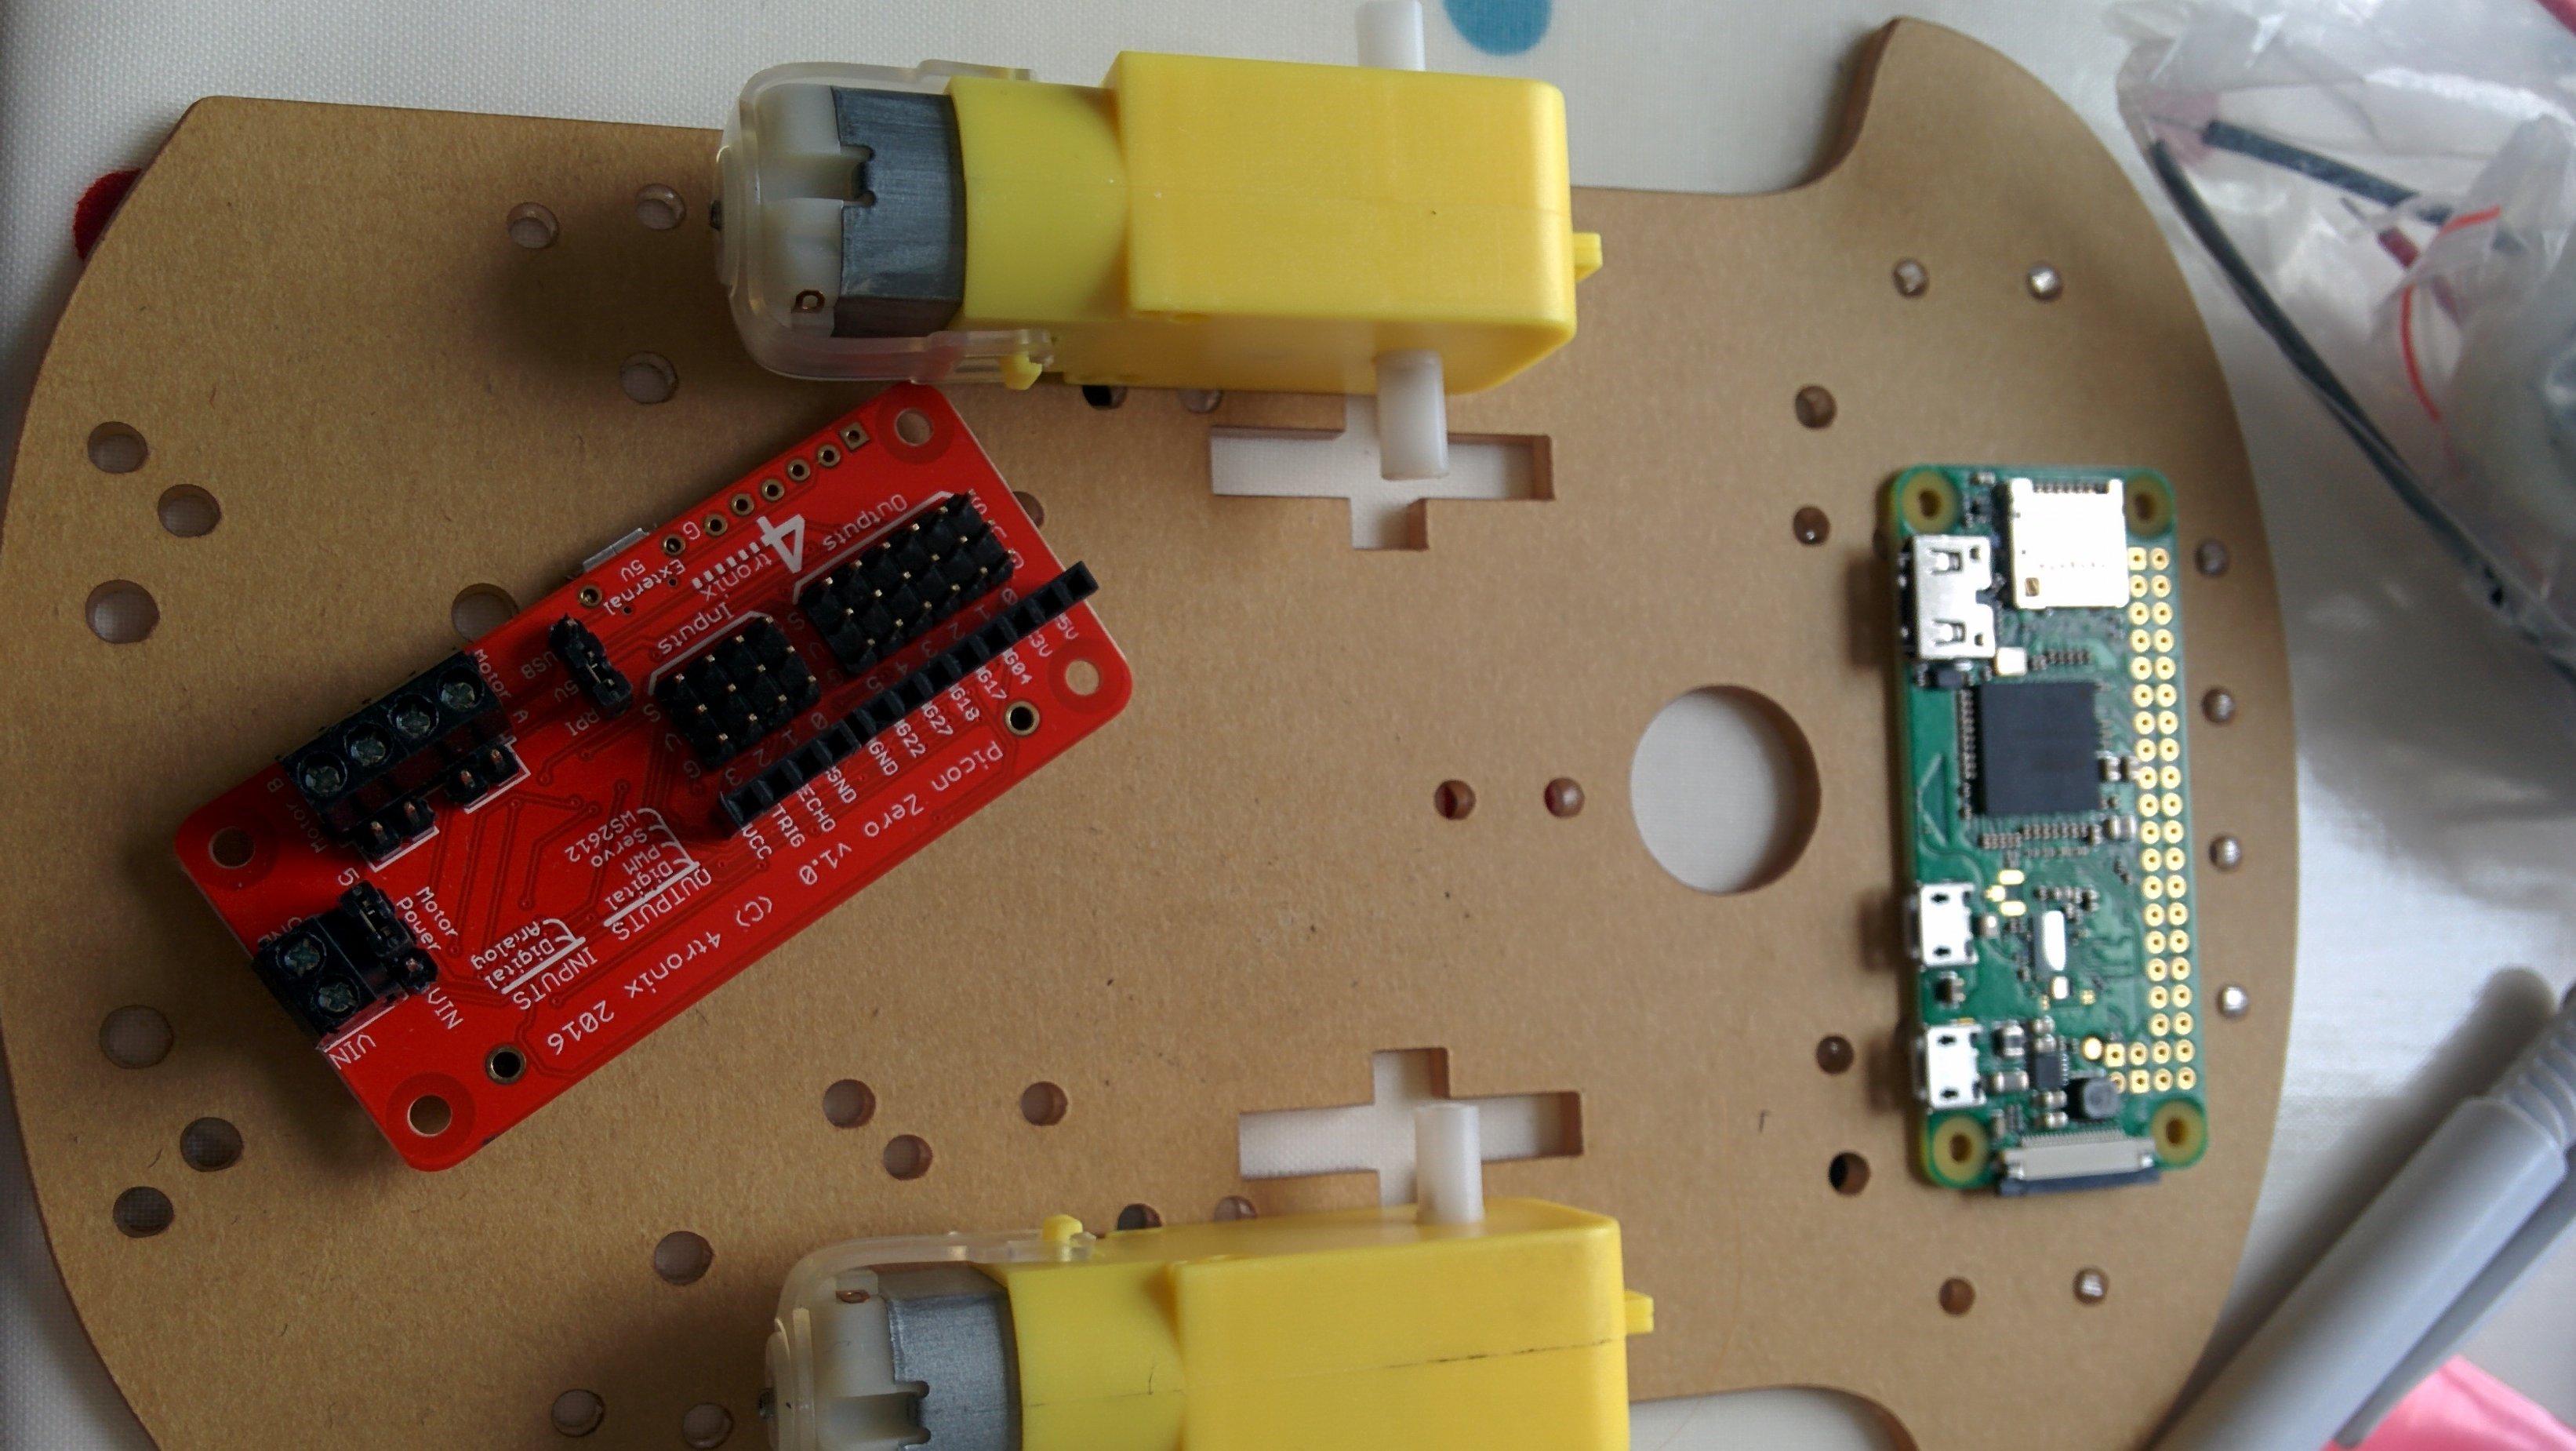 Building a robot using the new Raspberry Pi Zero W - JPoser/Blog